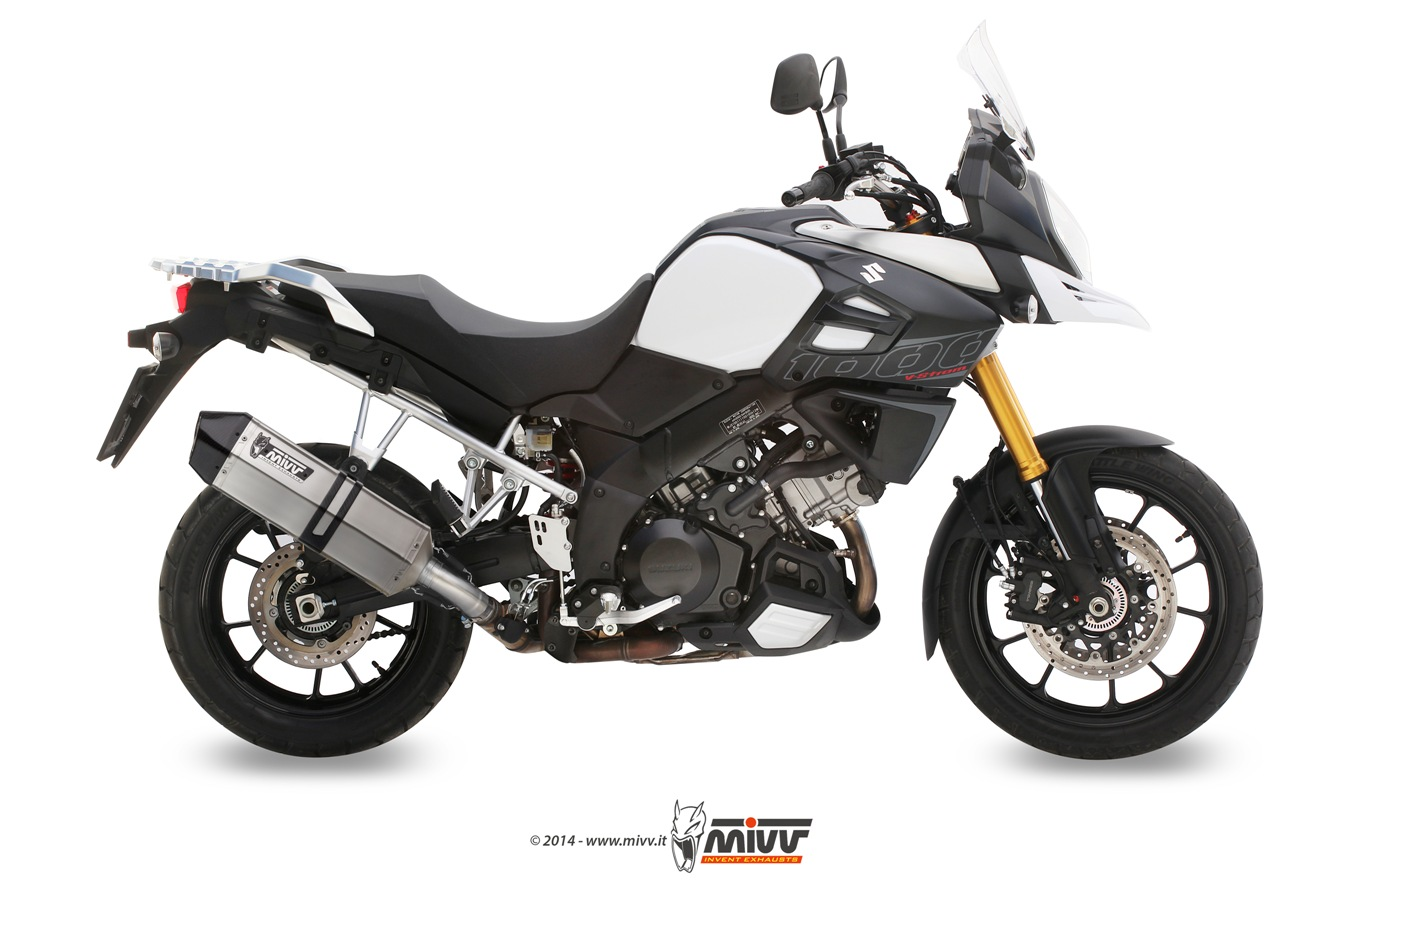 Escape homologado Mivv Speed Edge Acero inox para Suzuki DL V-STROM 1000 14-20/DL V-STROM 1050 20-20